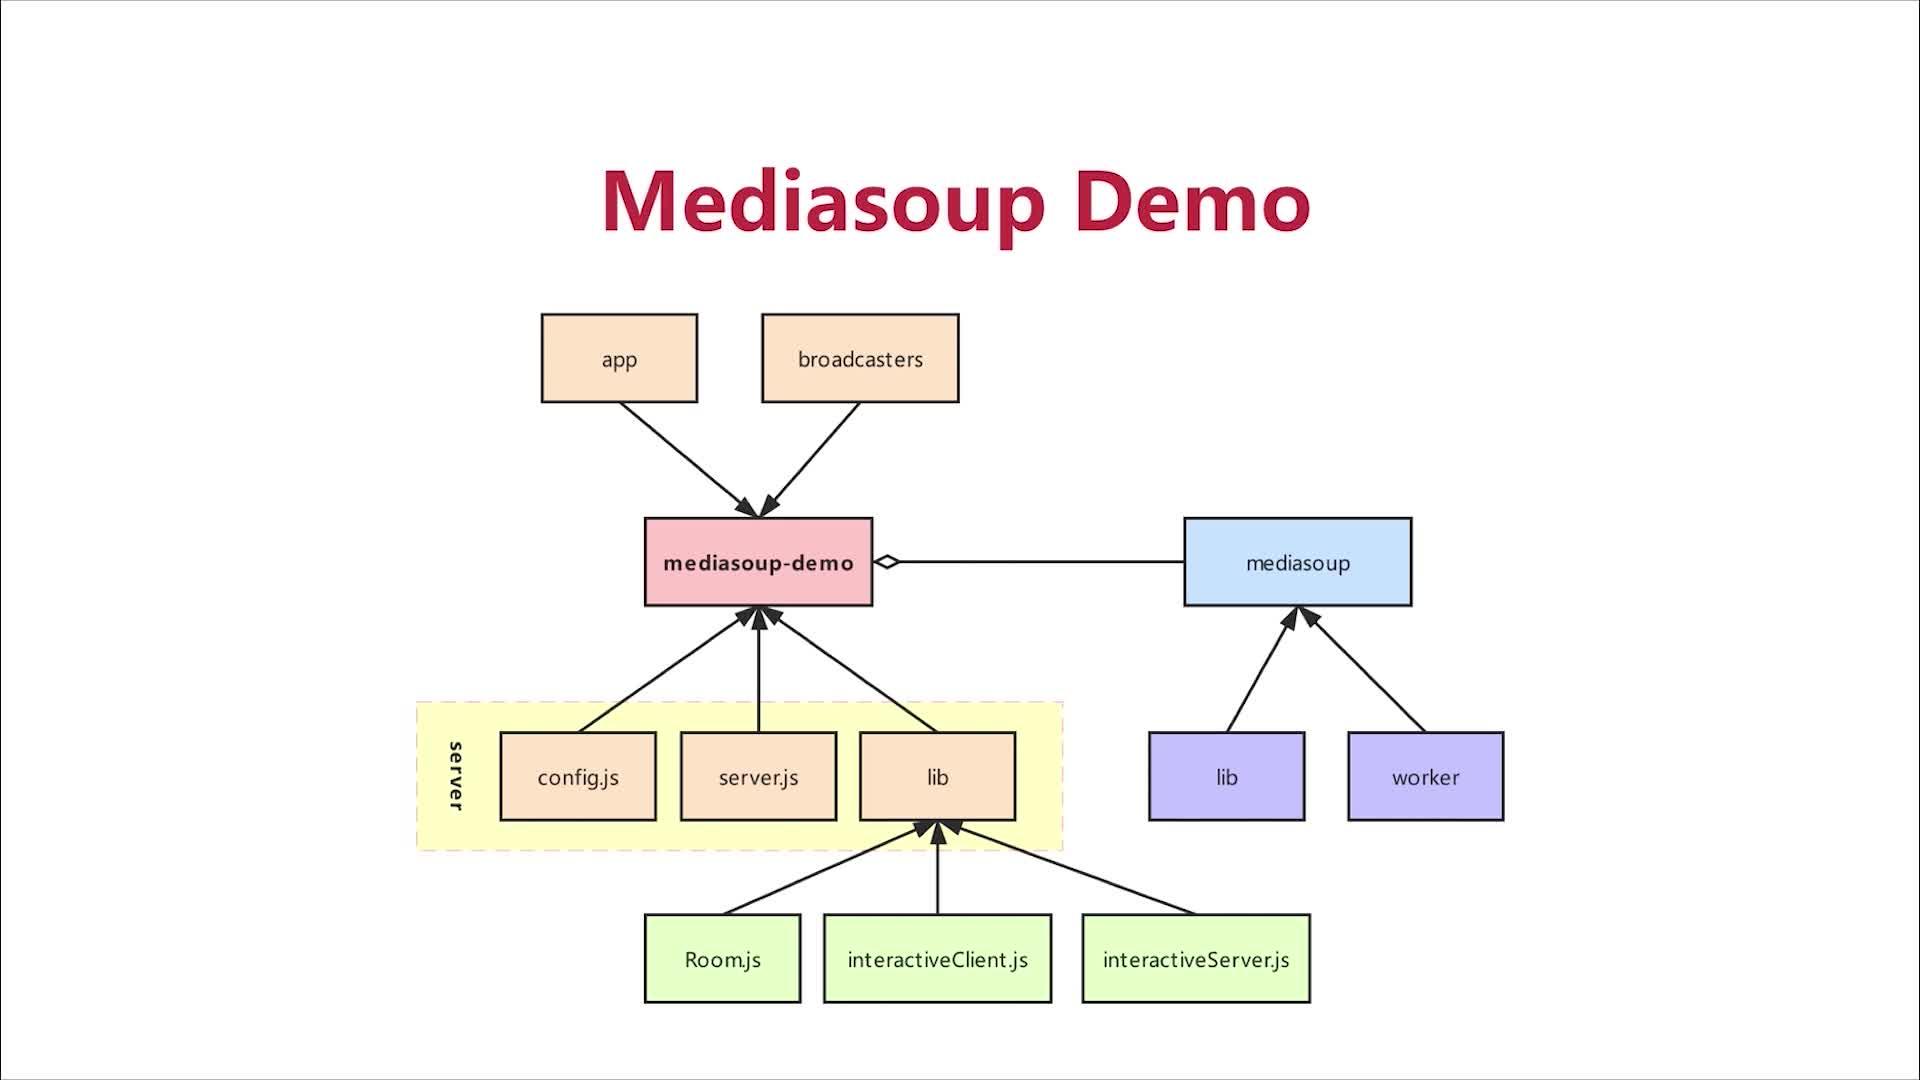 Mediasoup Demp